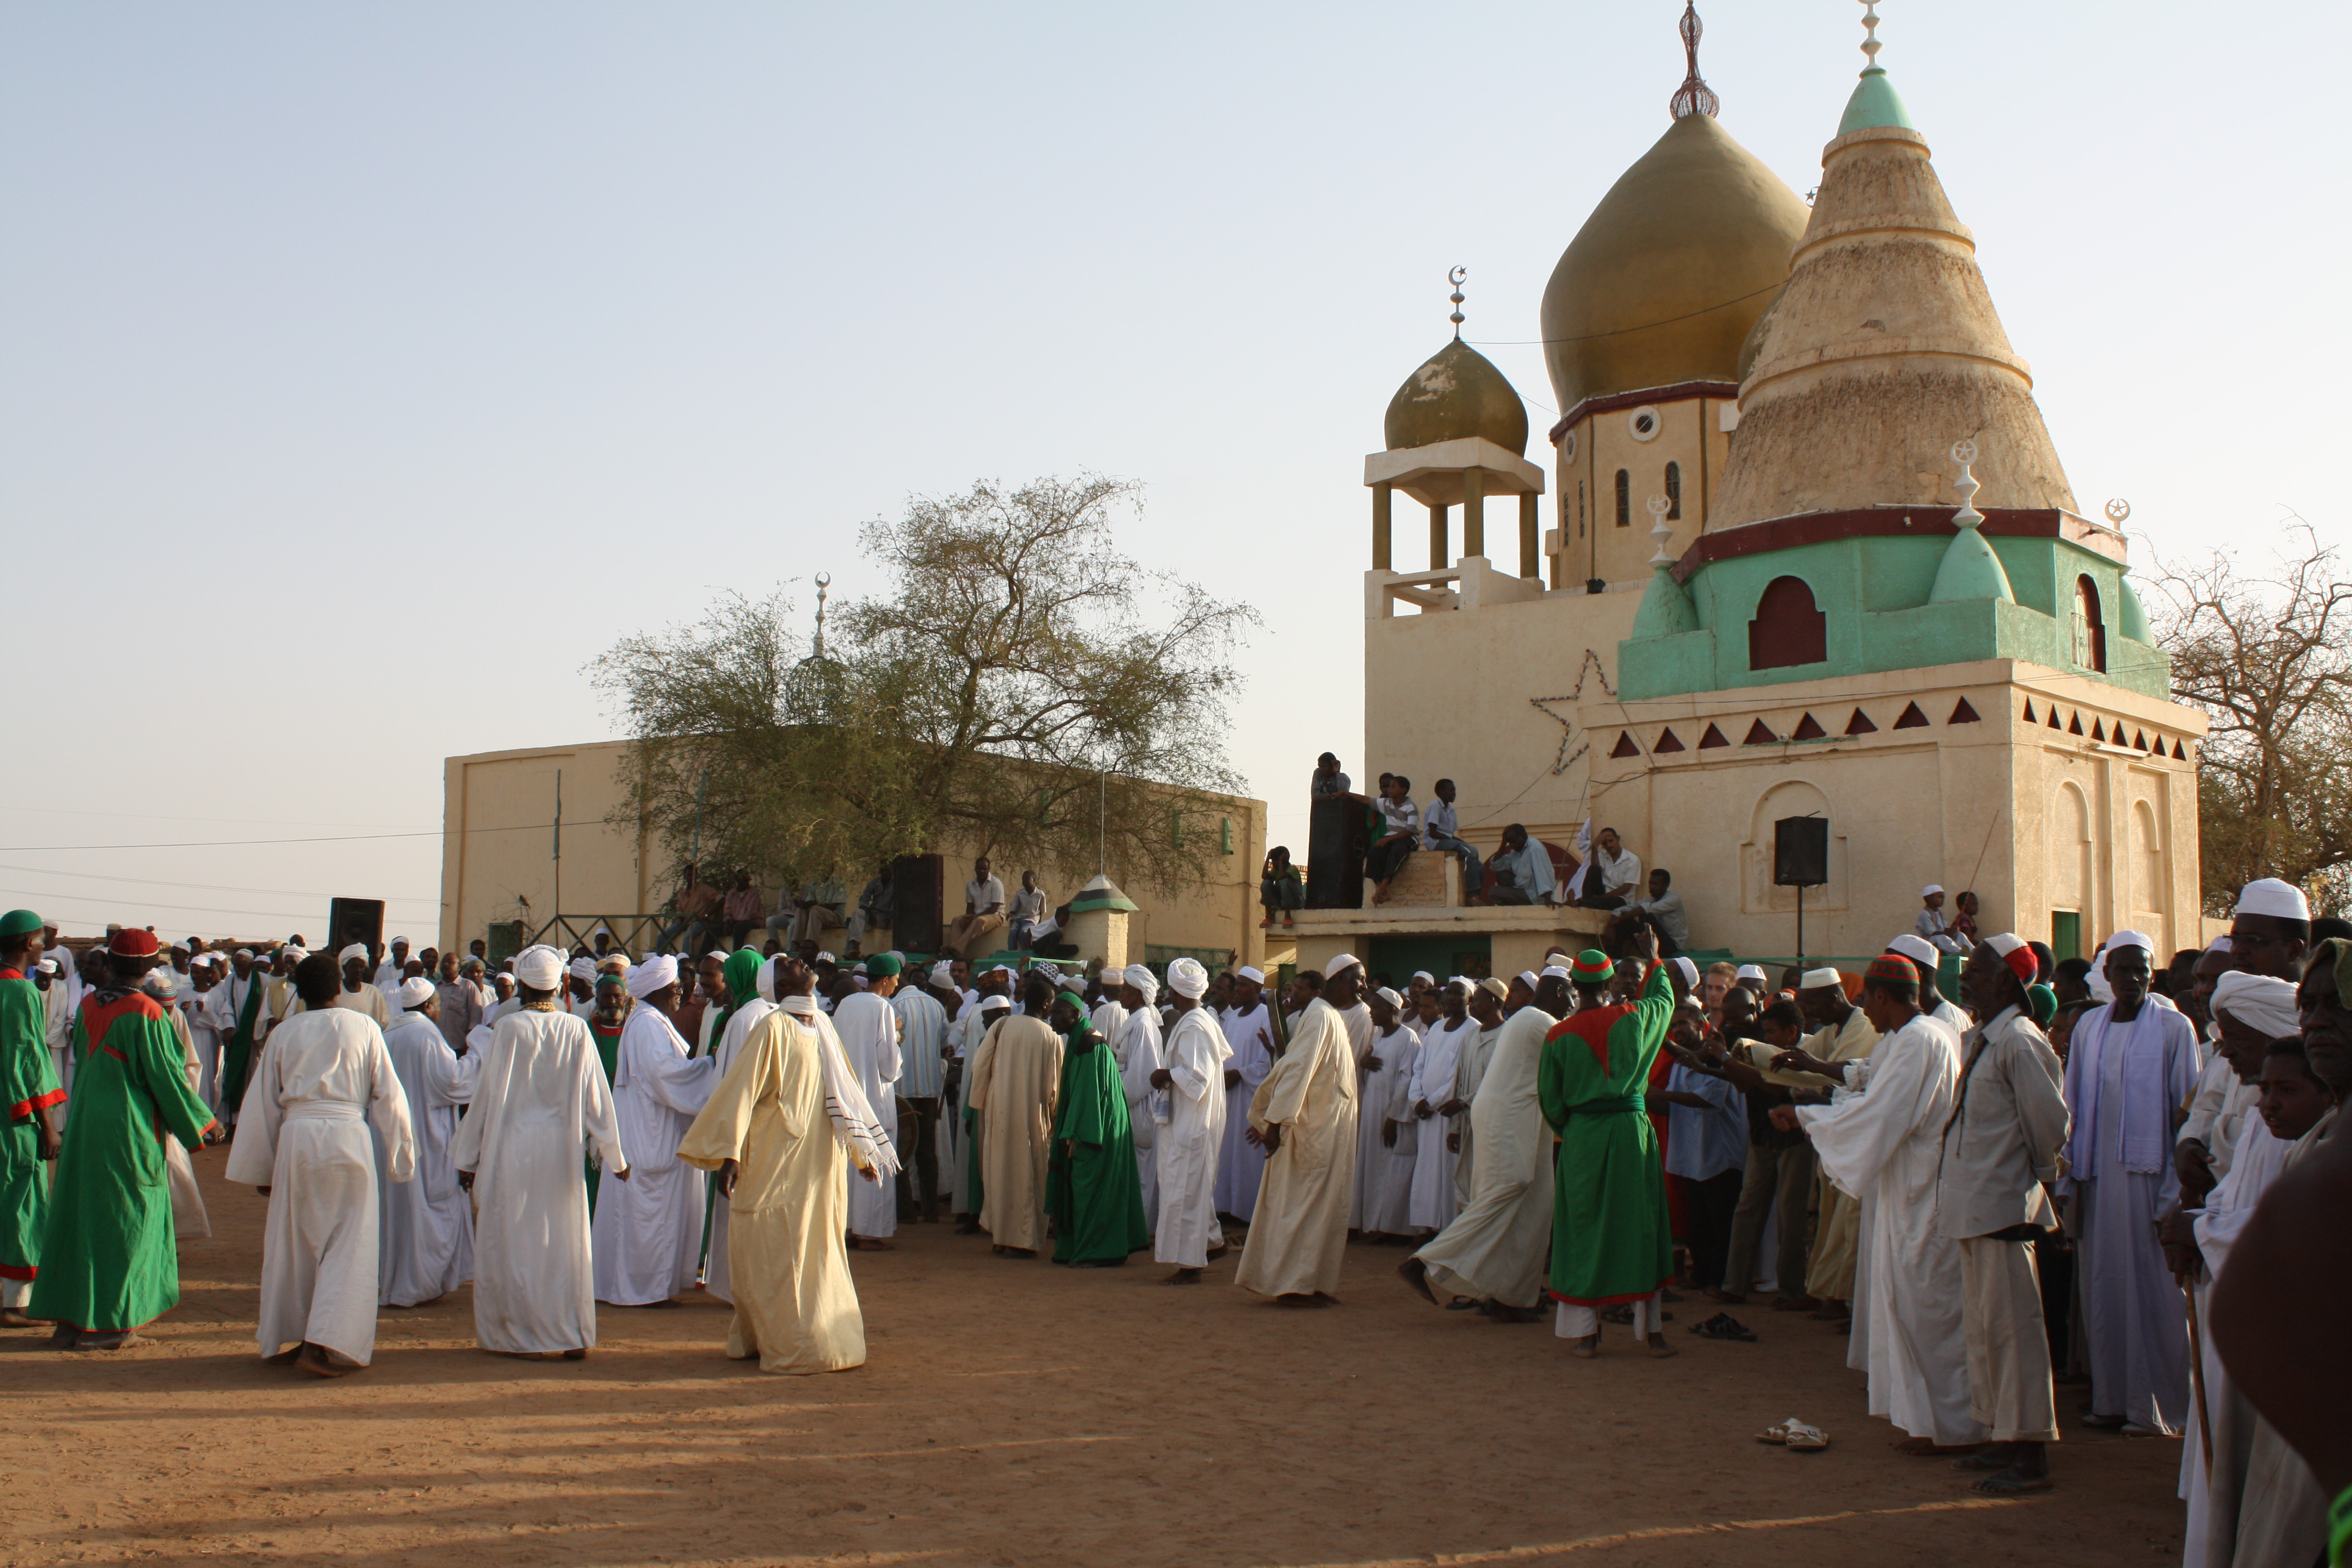 Sudan -- khartoum 2